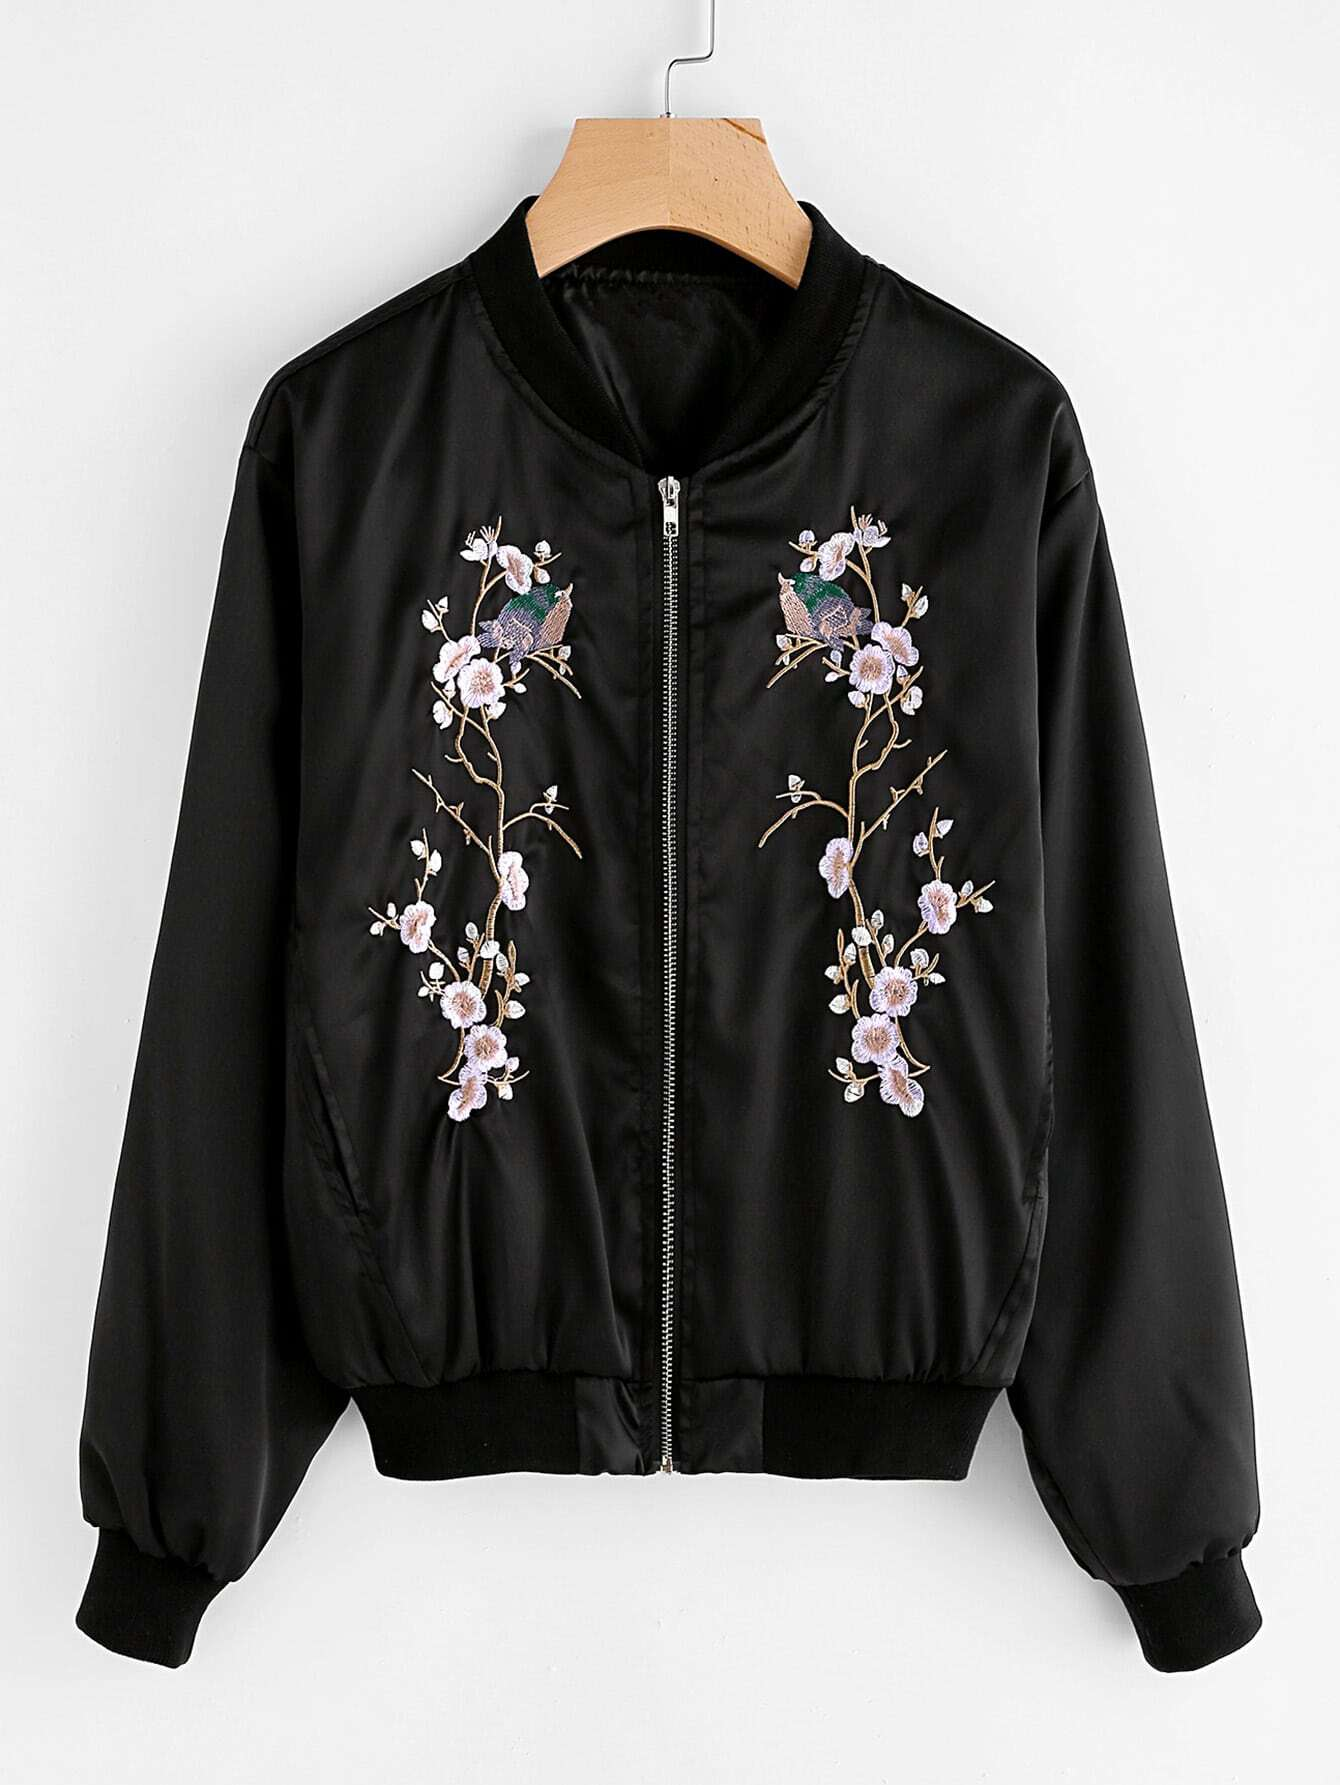 Plum Blossom Embroidered Ribbed Trim Jacket jacket170825101